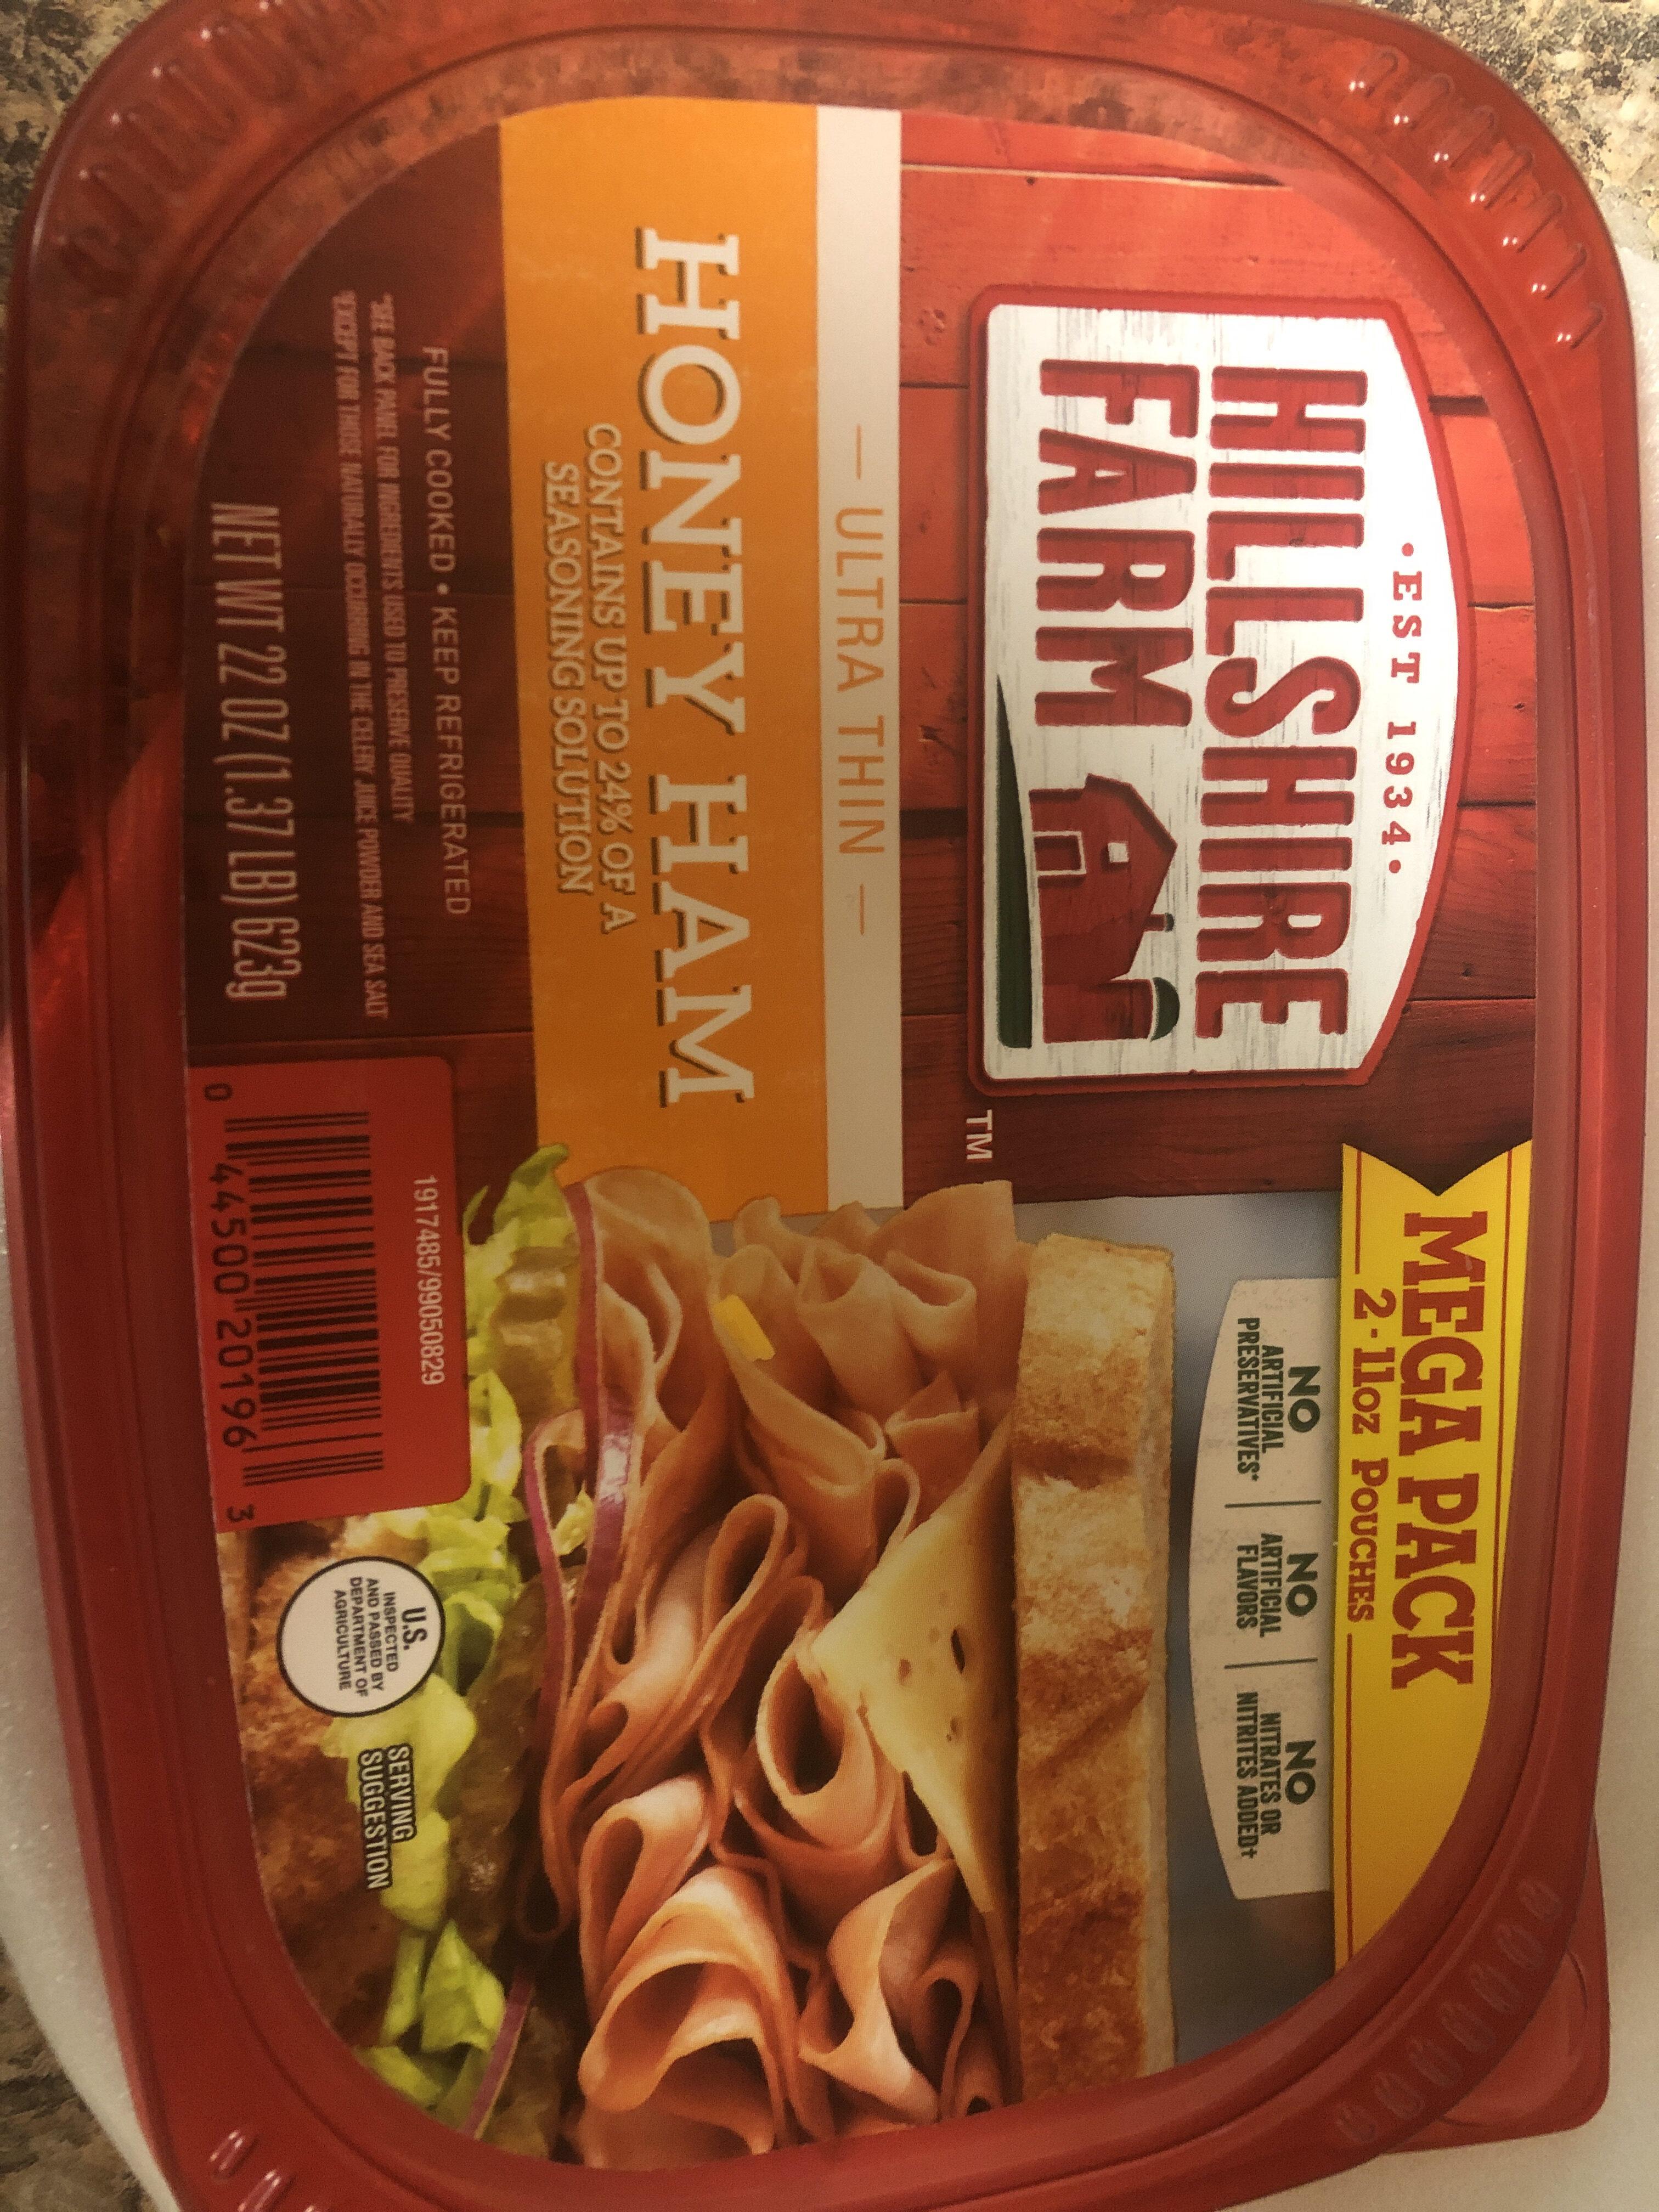 Hillshire farm honey ham - Product - en